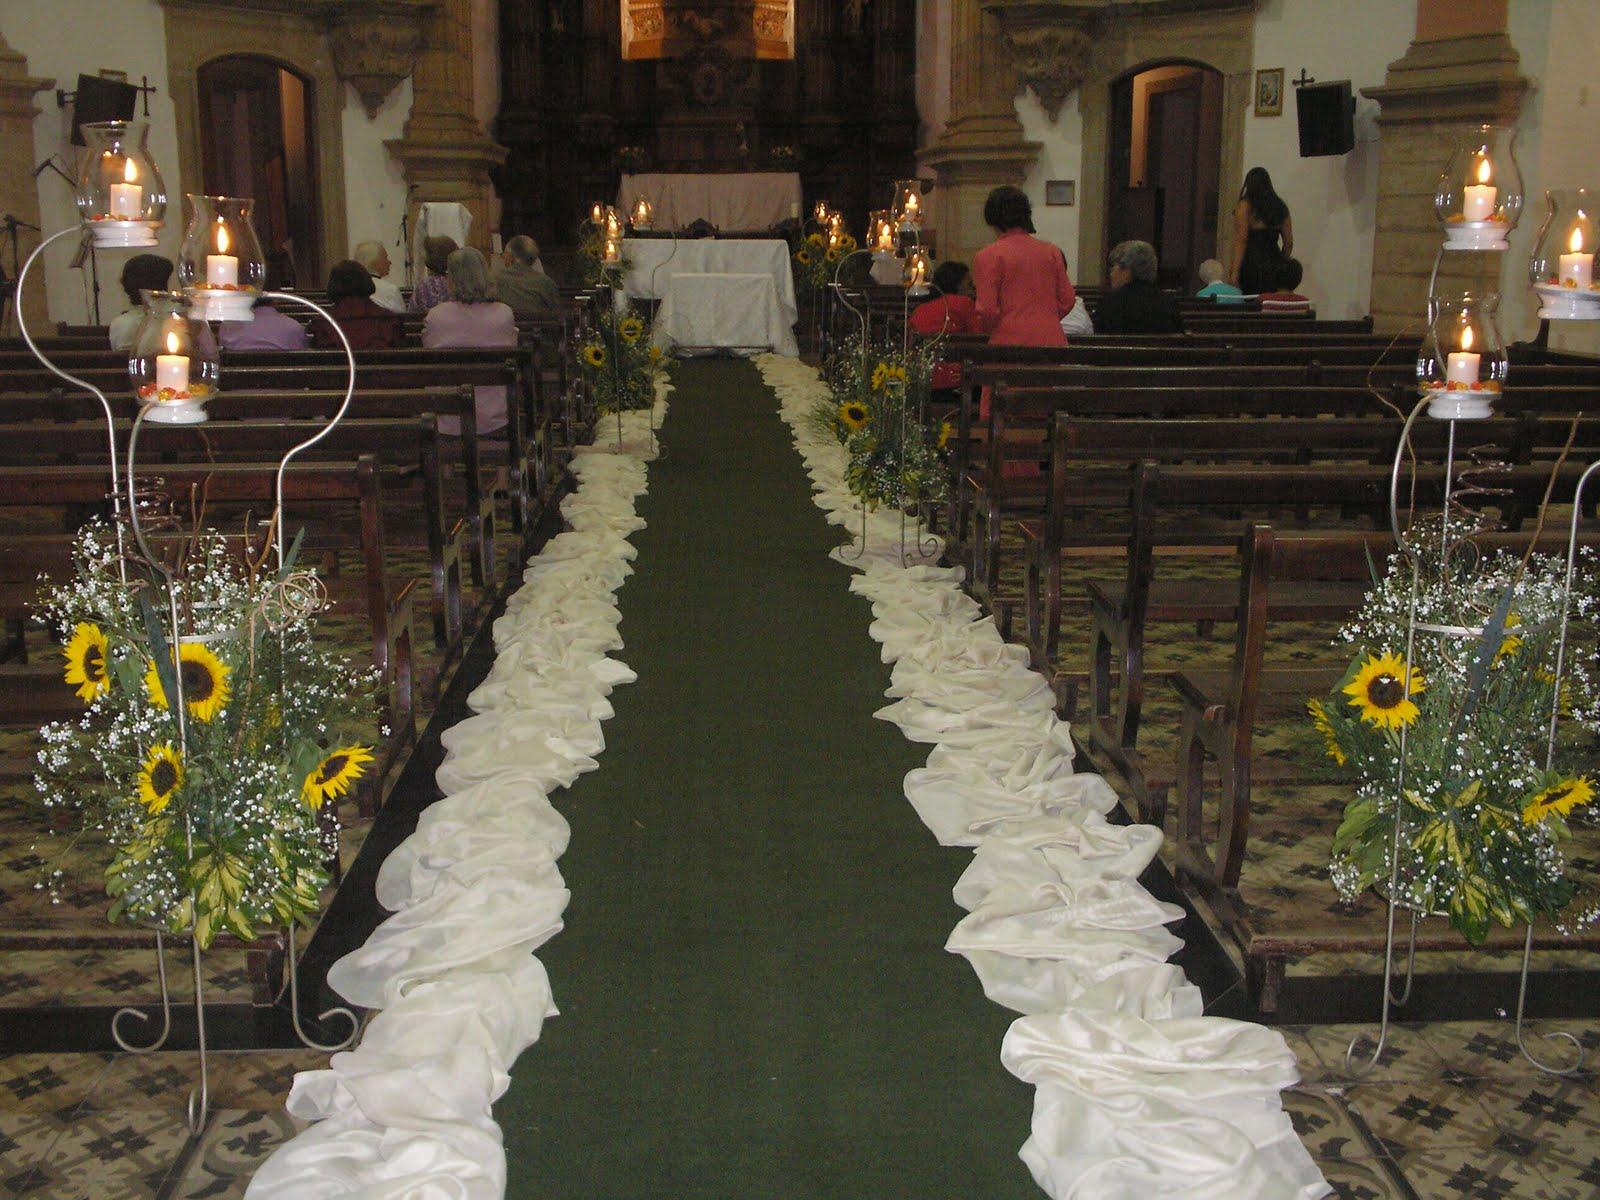 Bete Decora??es: Festa de Casamento. Decora??o de Girassol